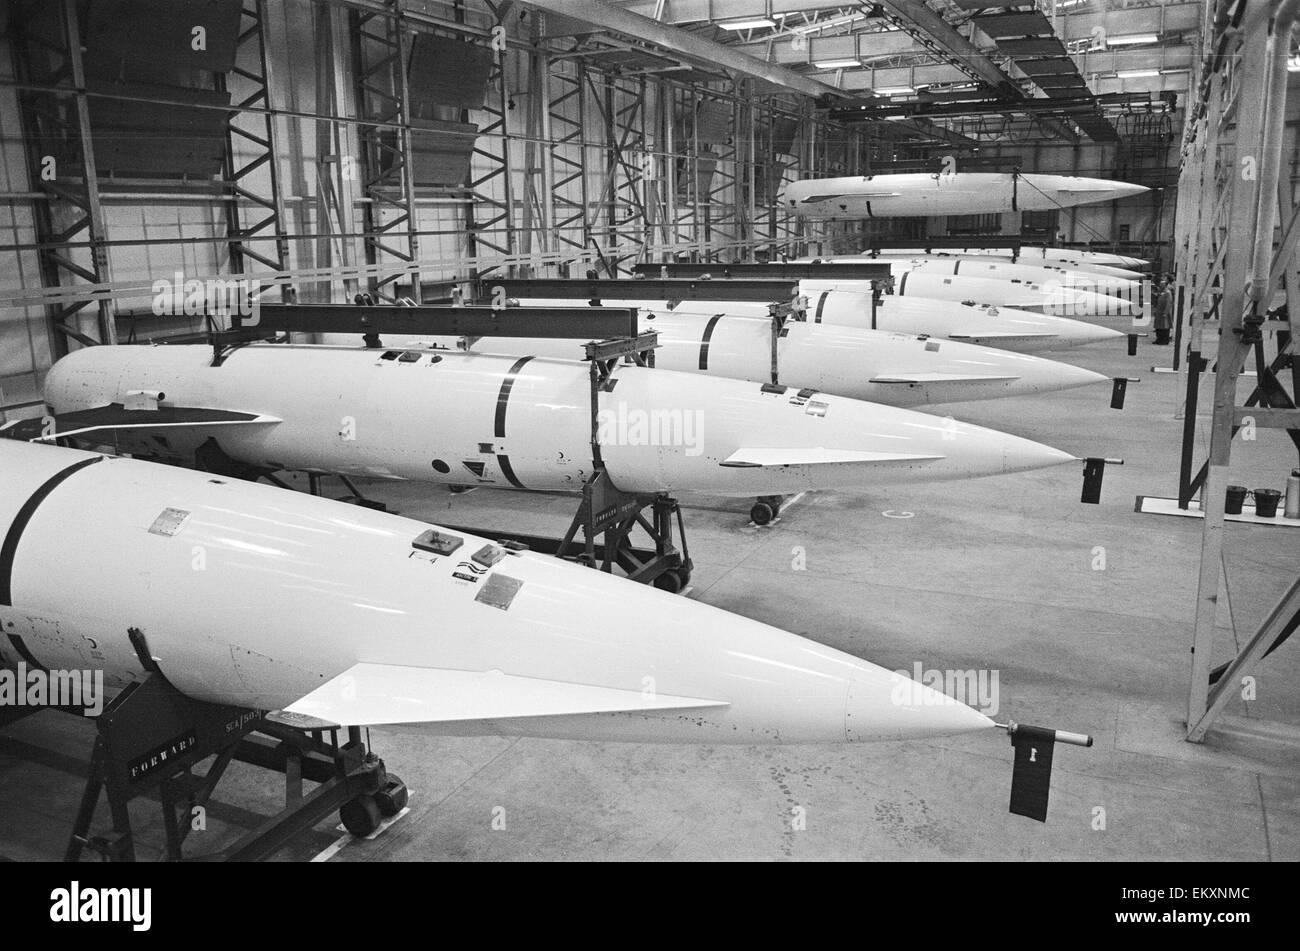 Il Thor missili in hangar. 1963. Immagini Stock